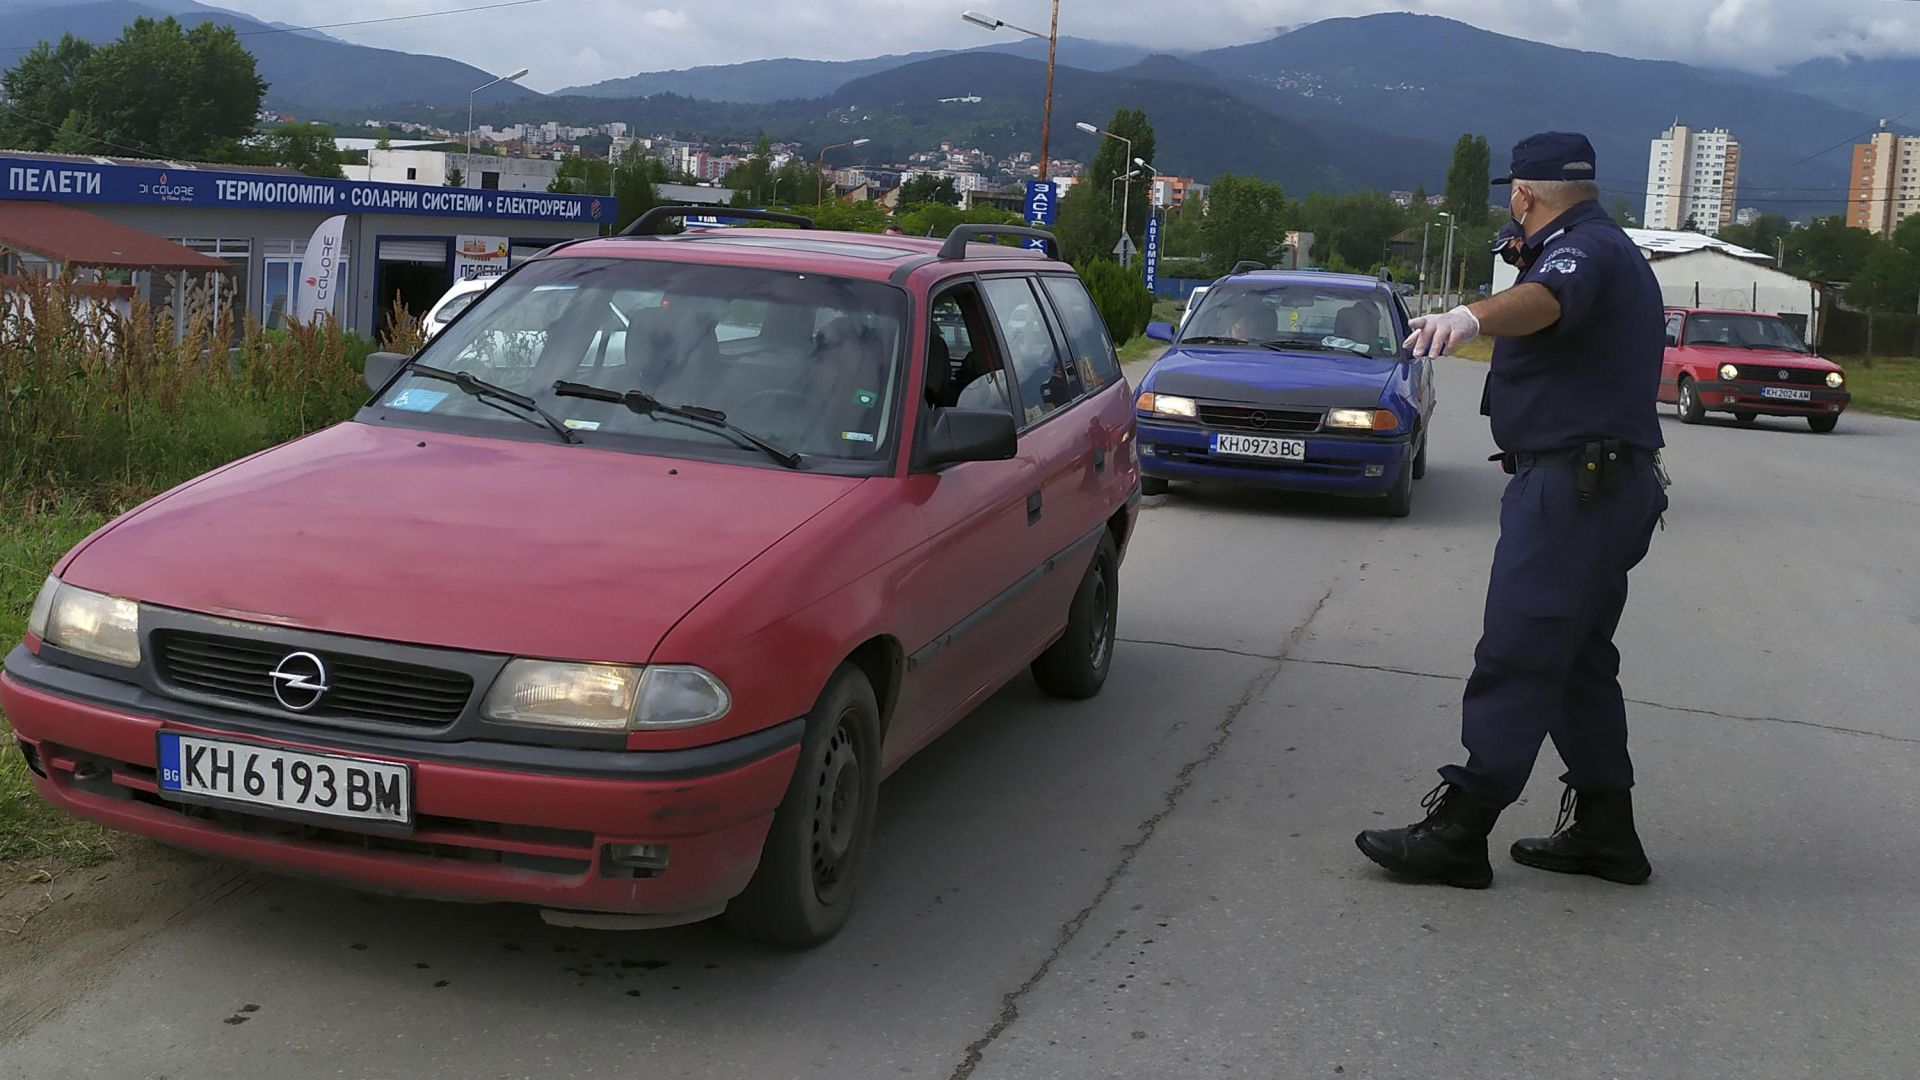 Затвориха ромския квартал в Кюстендил заради заразени с коронавирус (снимки)